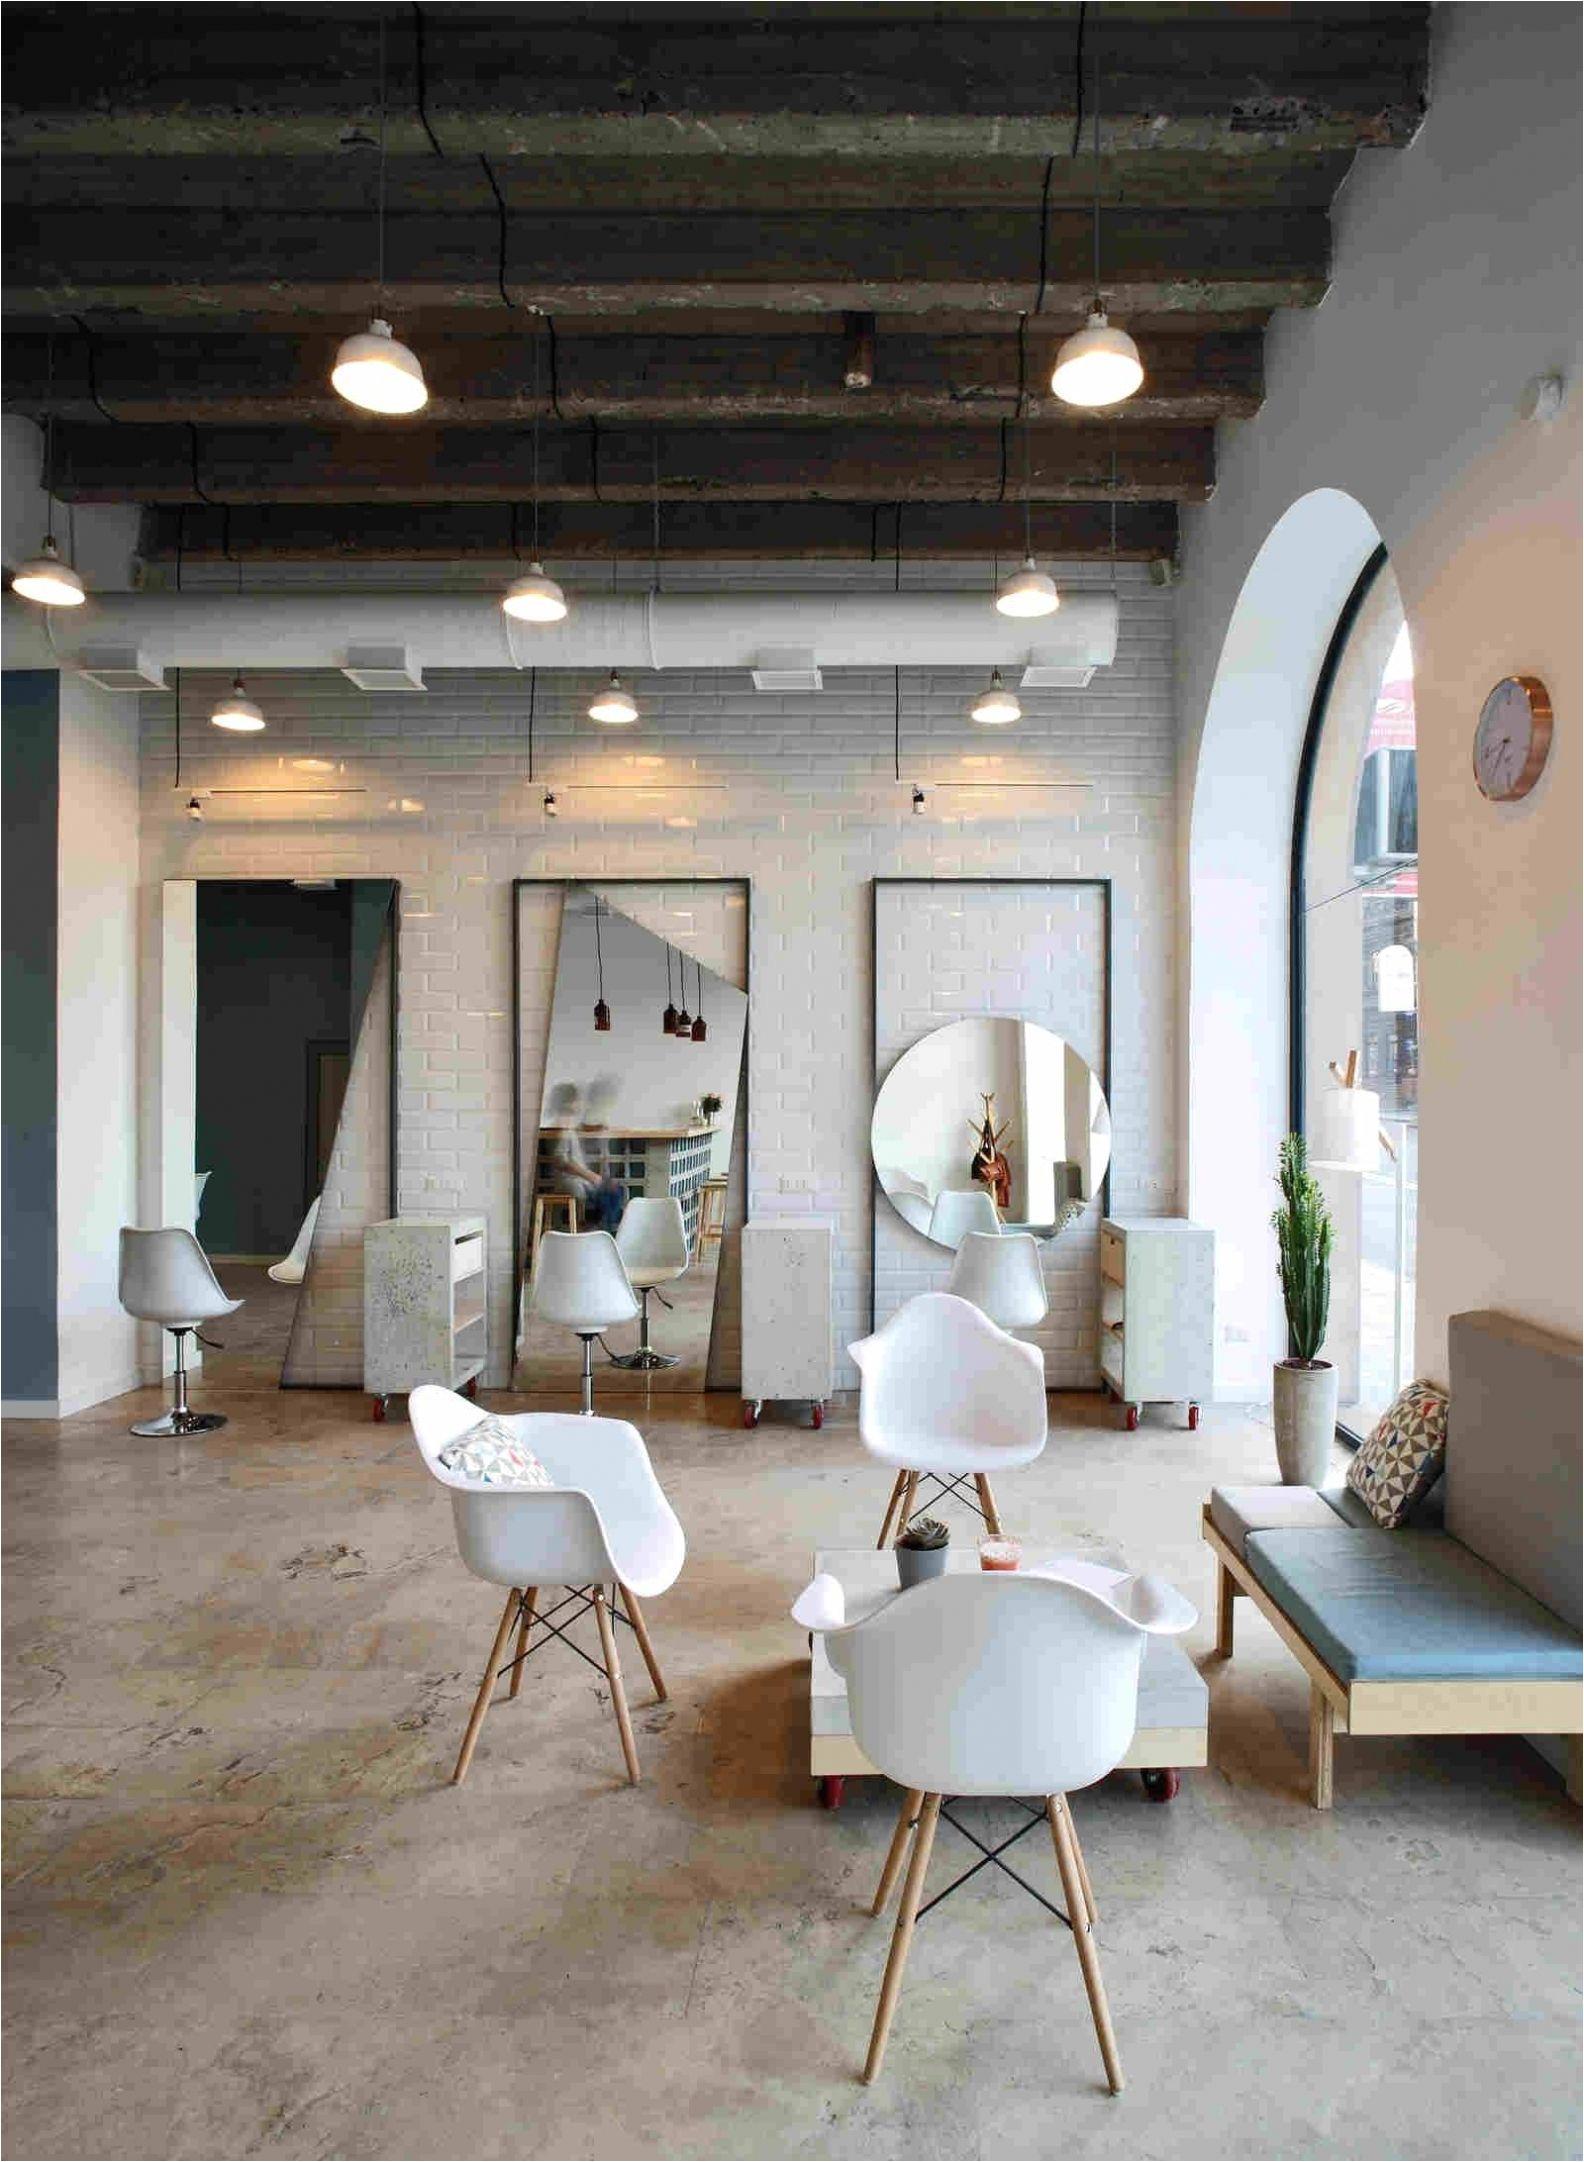 decoracion de salon hermoso fotos decoracion del hogar para salon ideas de decoracion de salon od